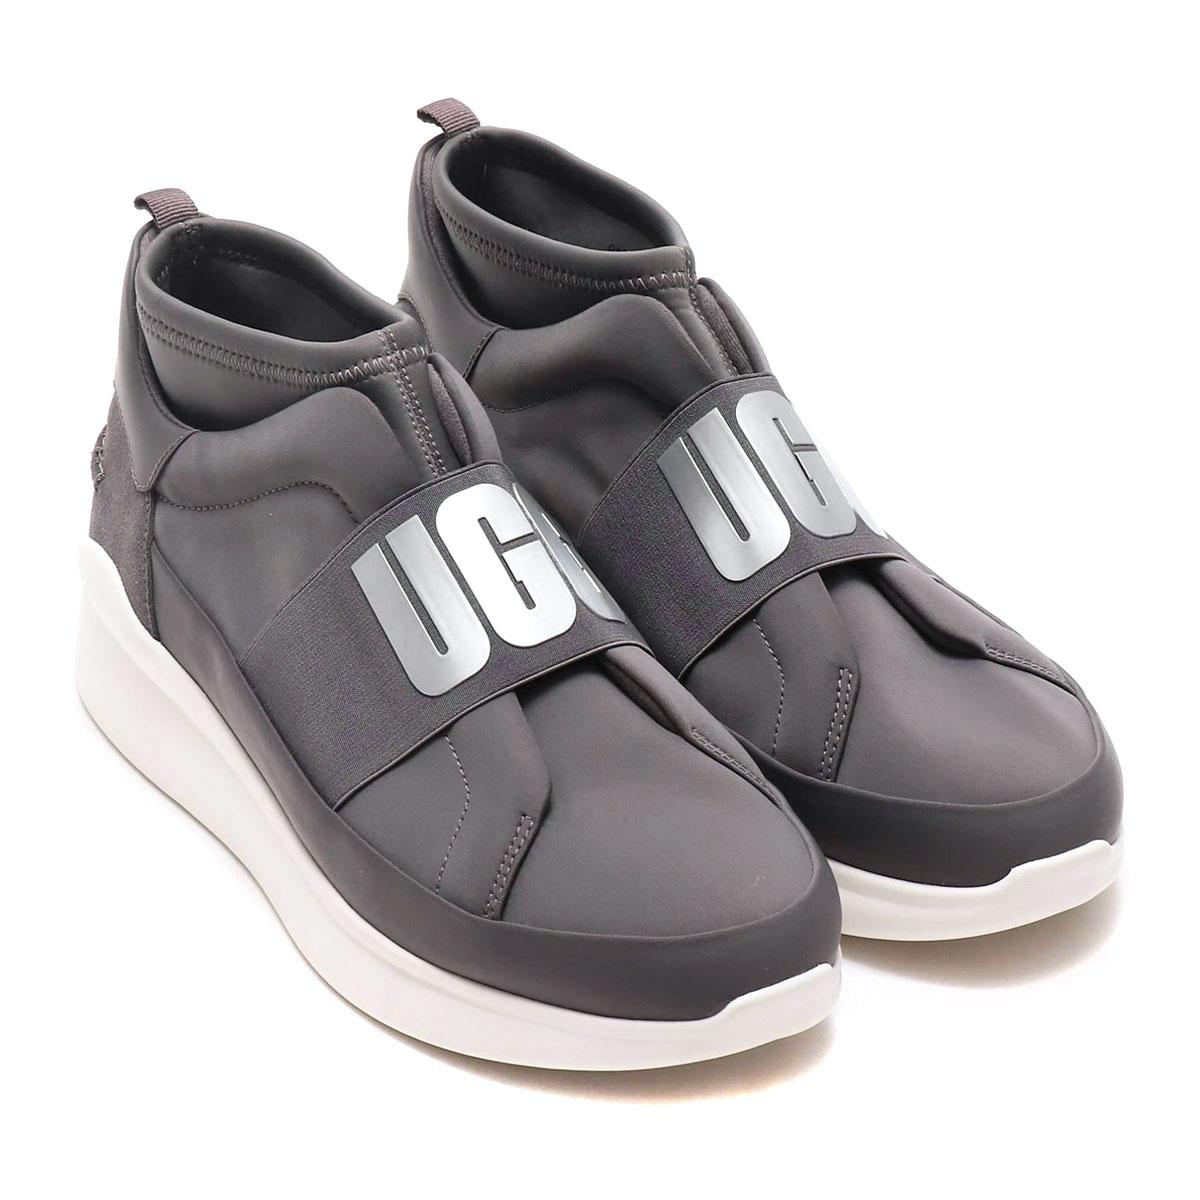 UGG Neutra Sneaker (アグ ニュートラ スニーカー)CHARCOAL【レディース スニーカー】18FW-I